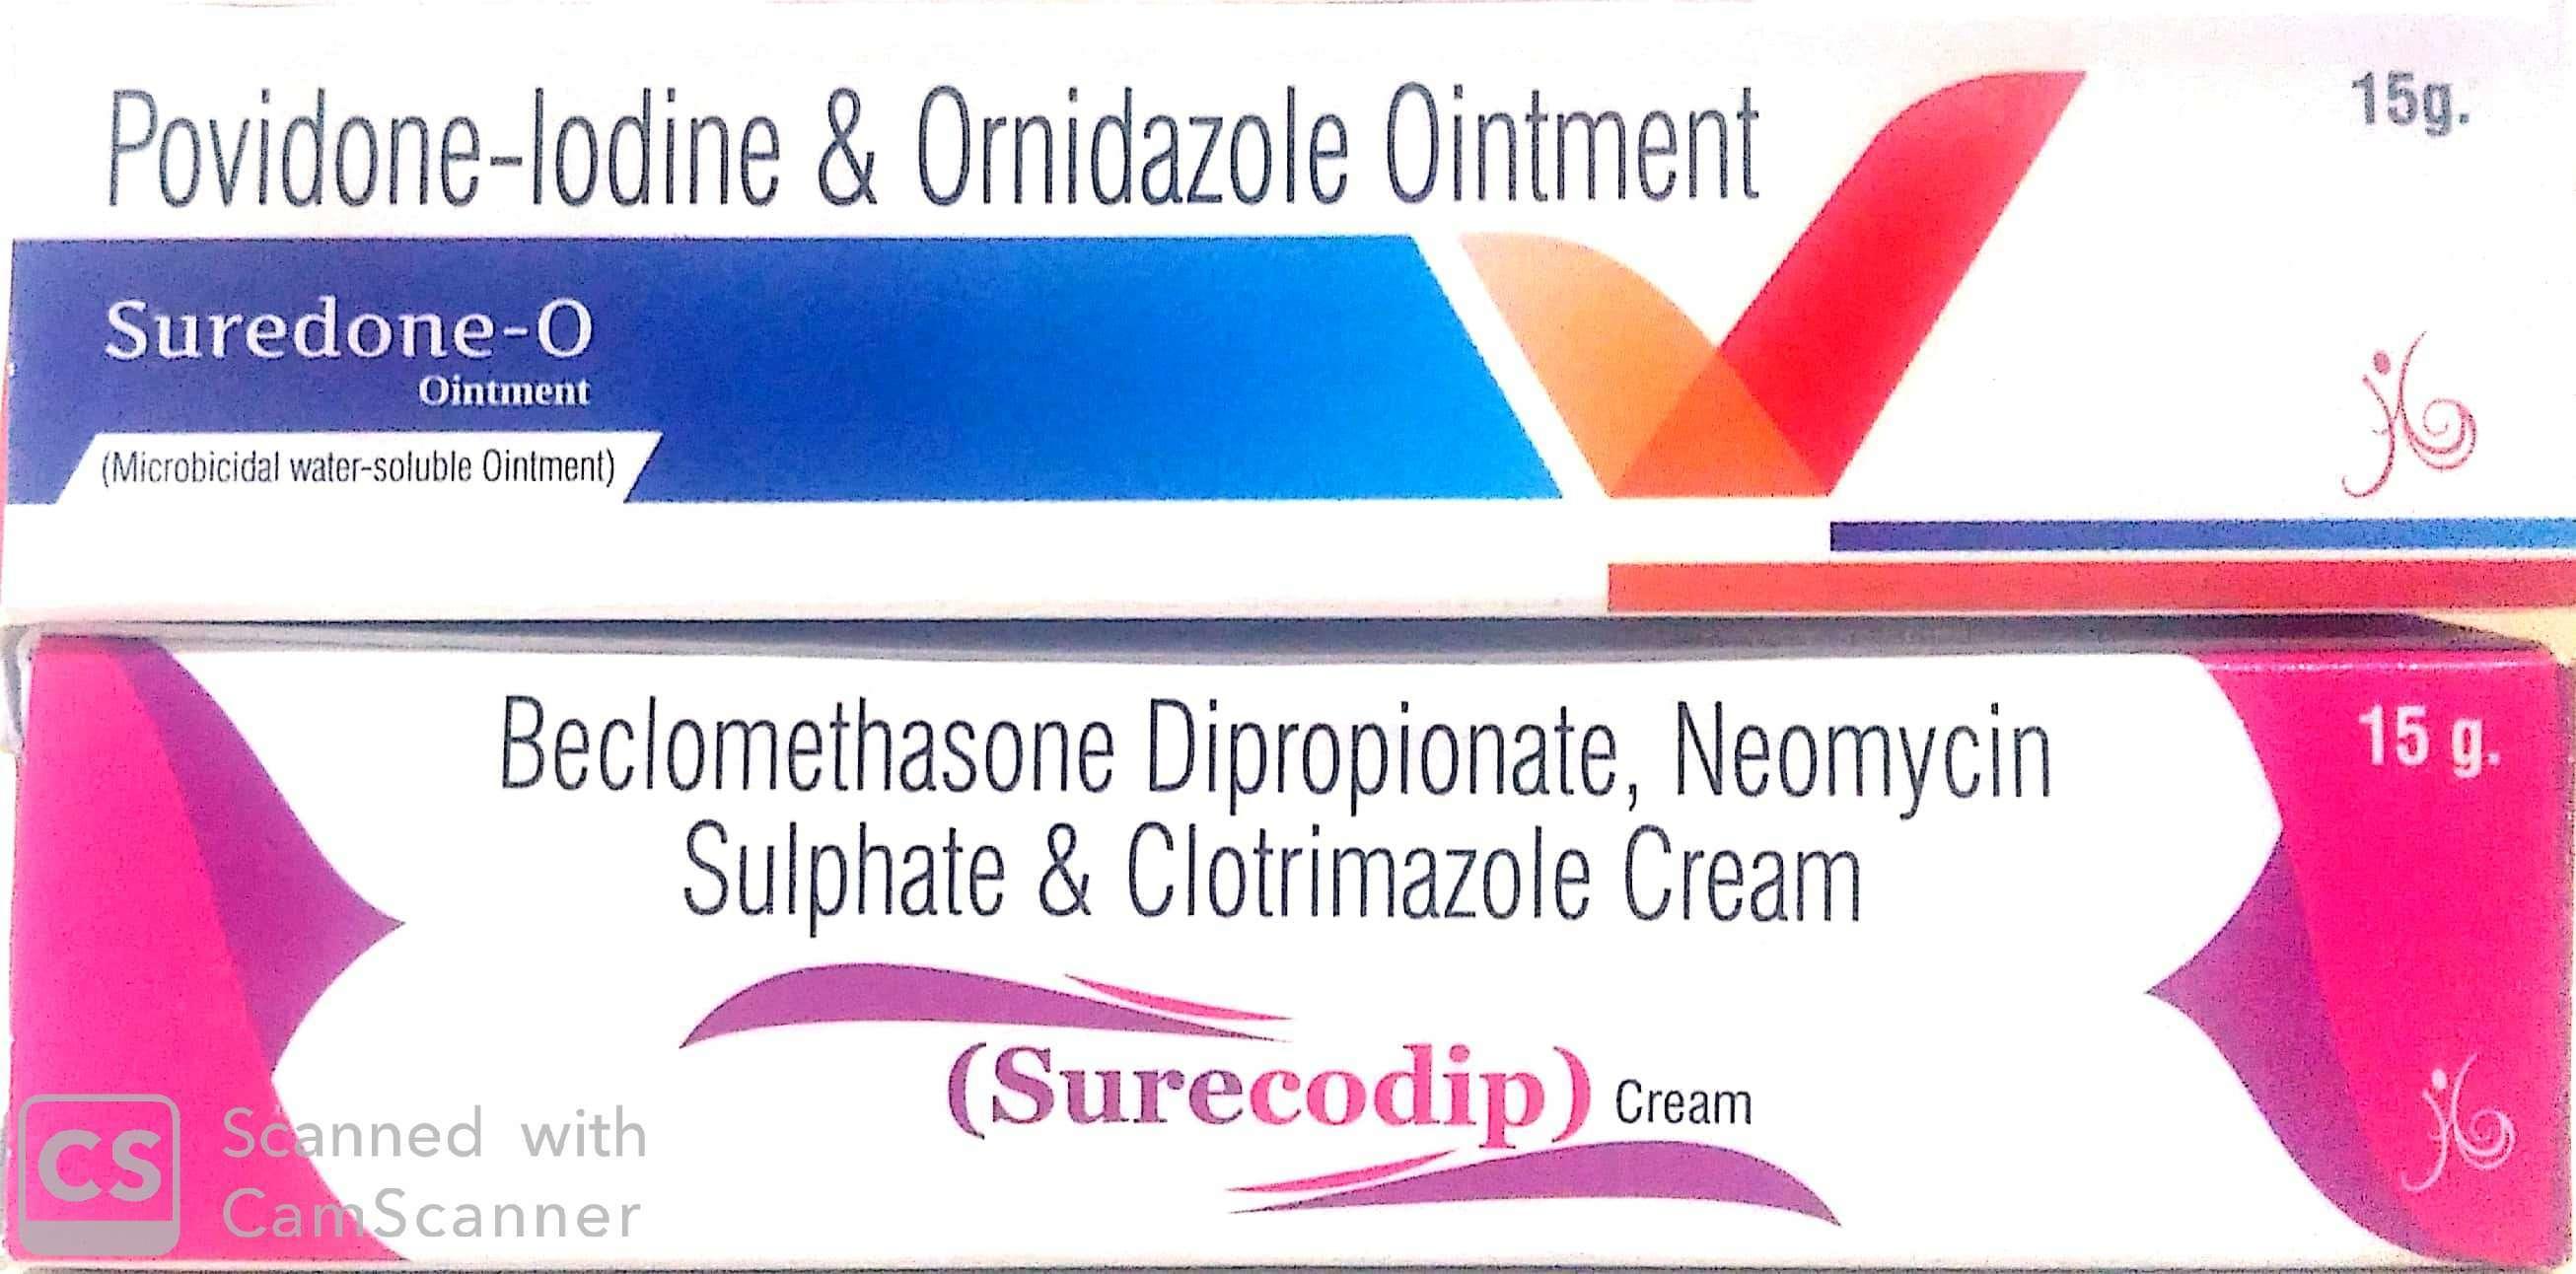 Povidone Iodine with Ornidazole Tablets